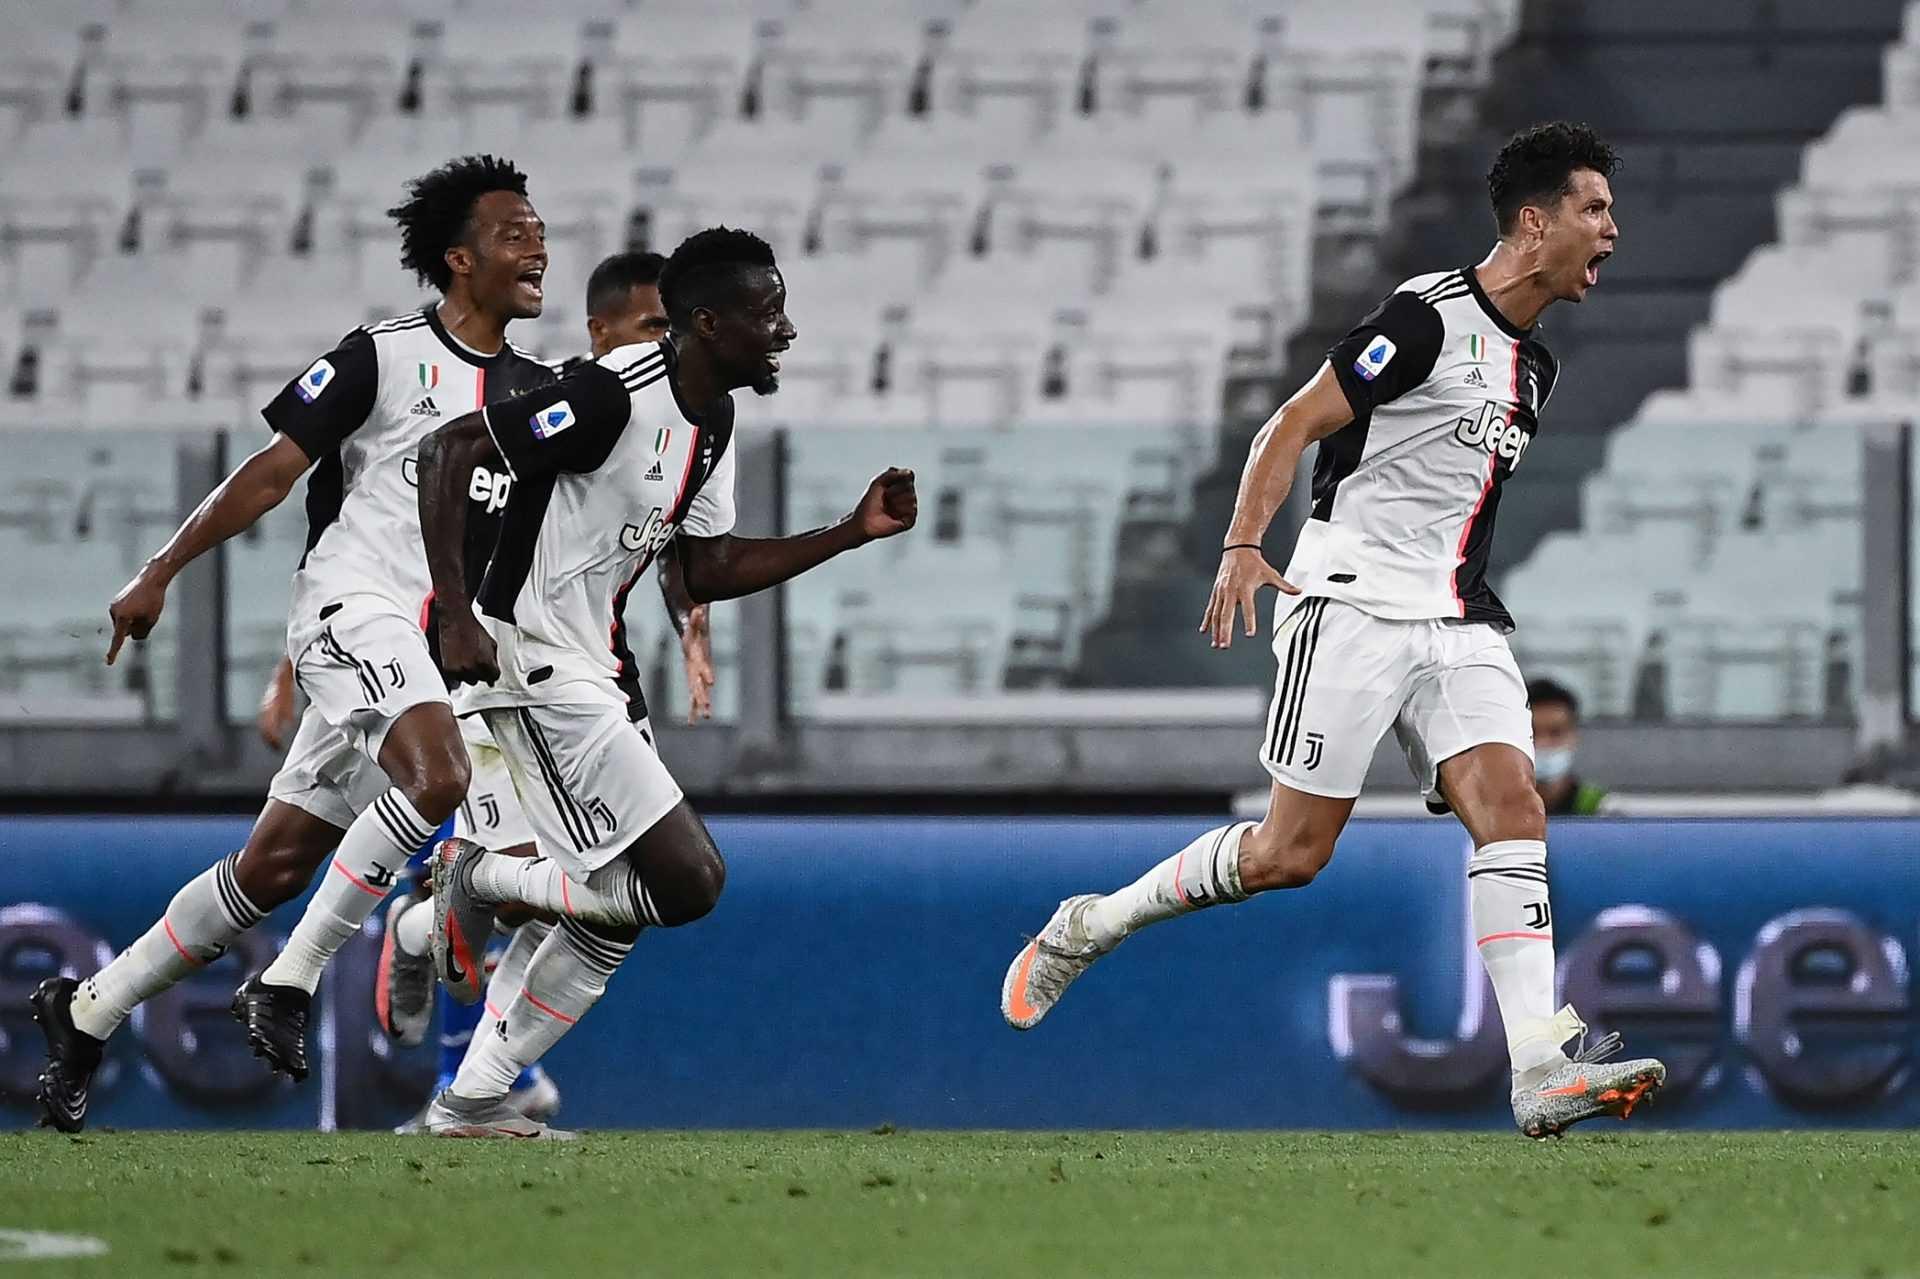 Juventus-Sampdoria (2-0): analisi tattica e considerazioni